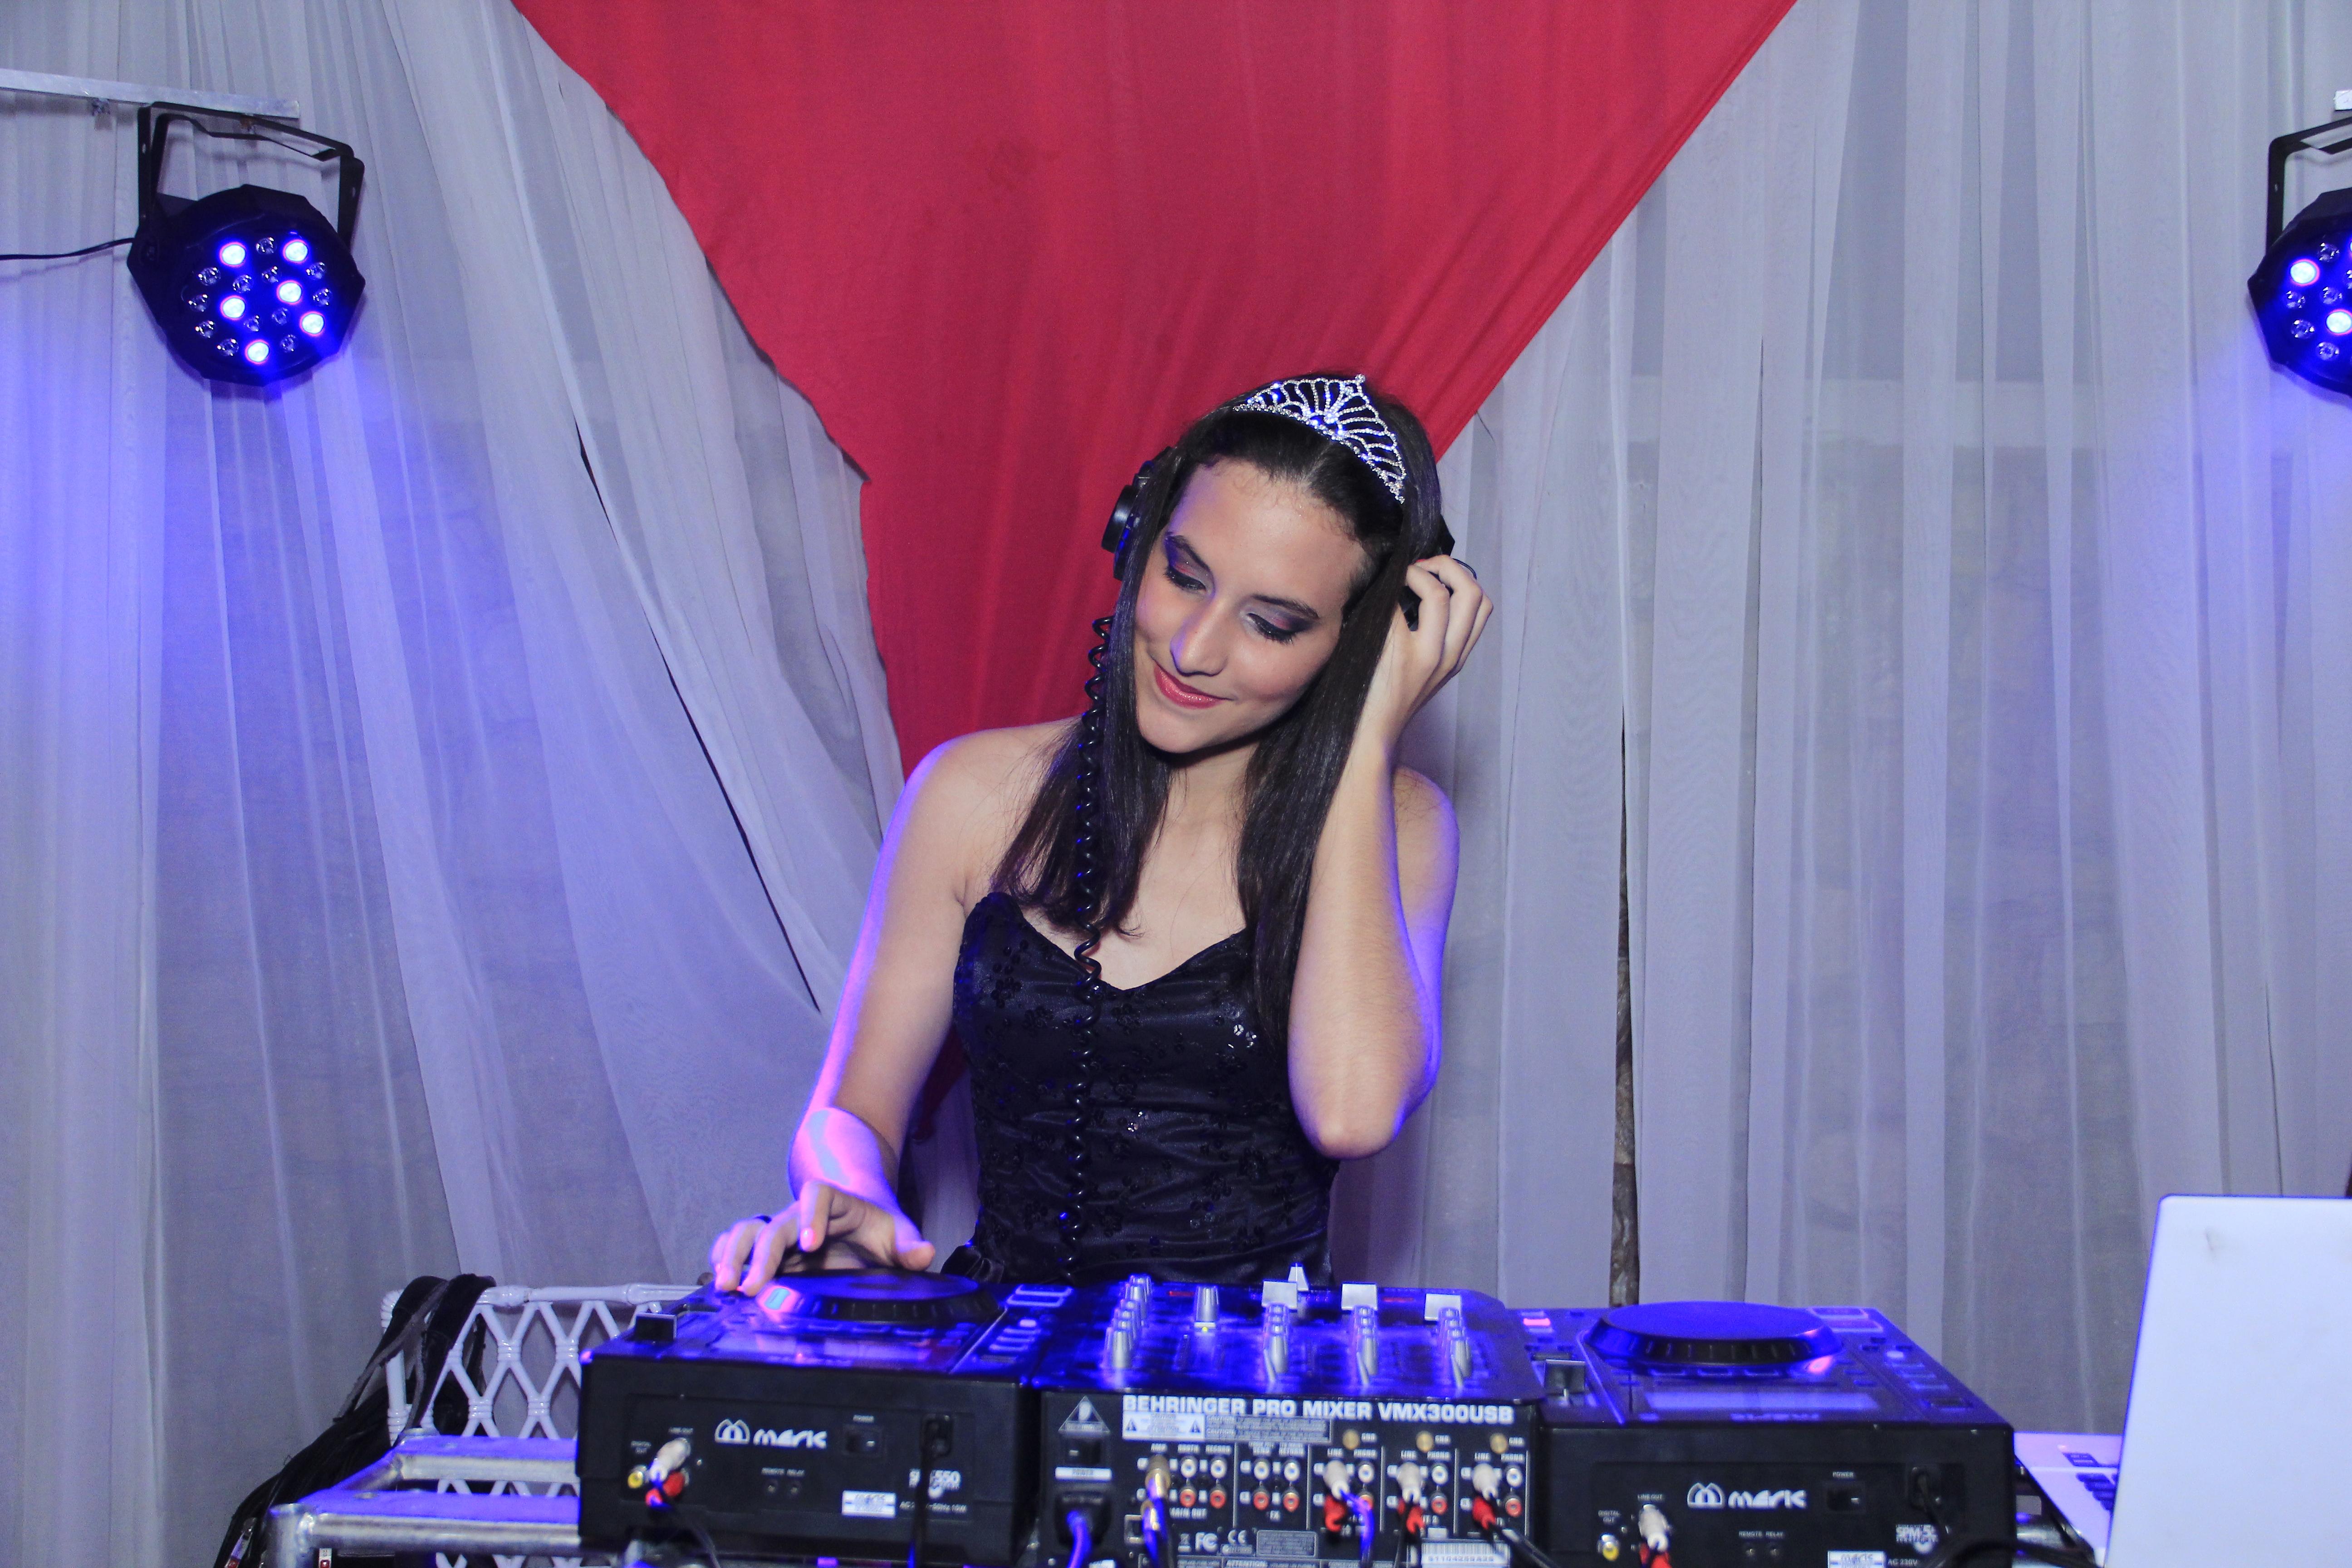 Maria Eduarda_067